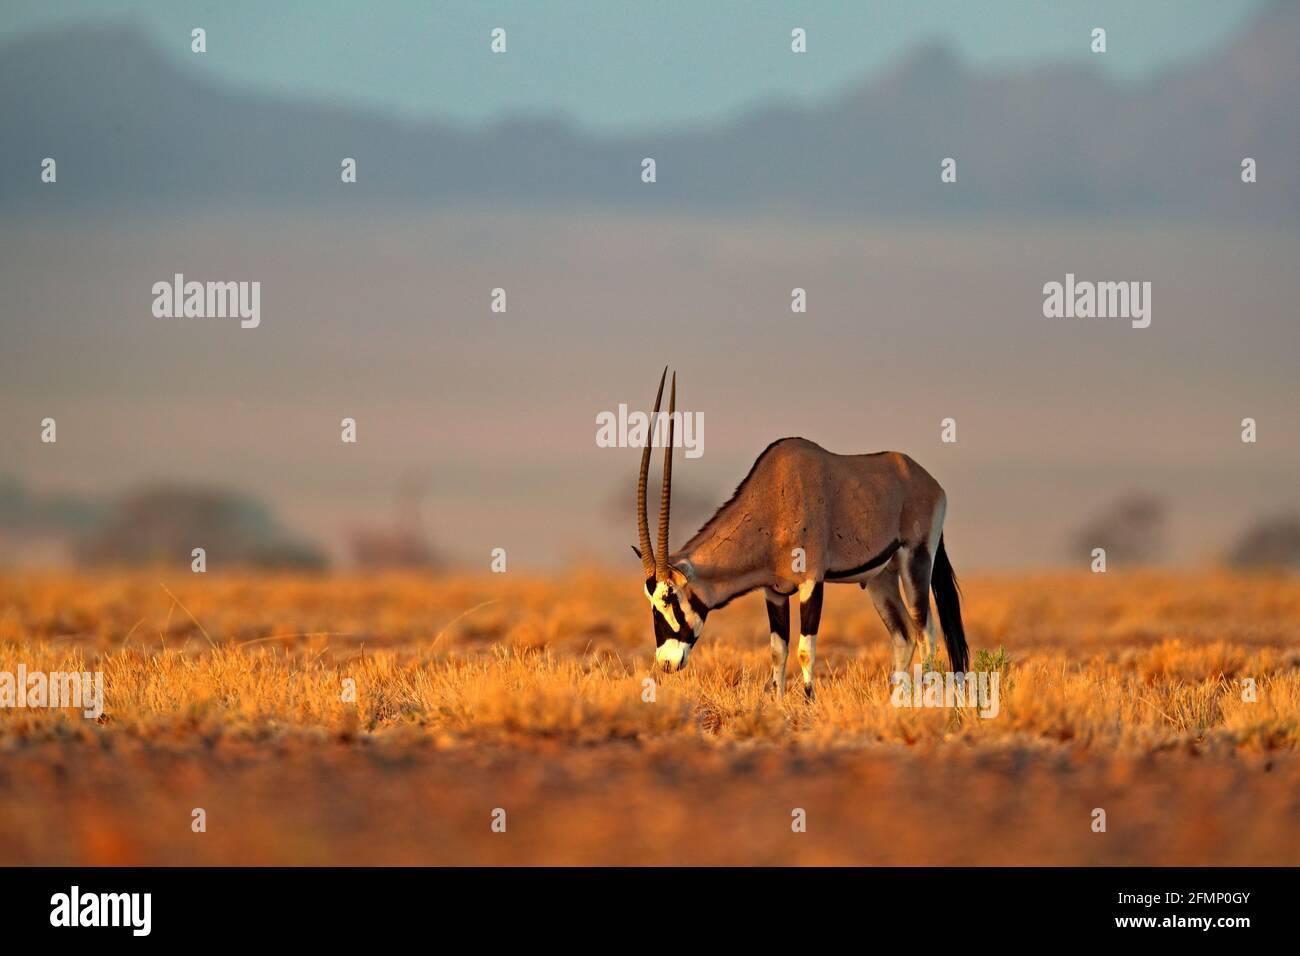 Oryx gazella beautiful iconic gemsbok antelope from Namib desert, Namibia. Oryx with orange sand dune evening sunset. Gemsbock large antelope in natur Stock Photo